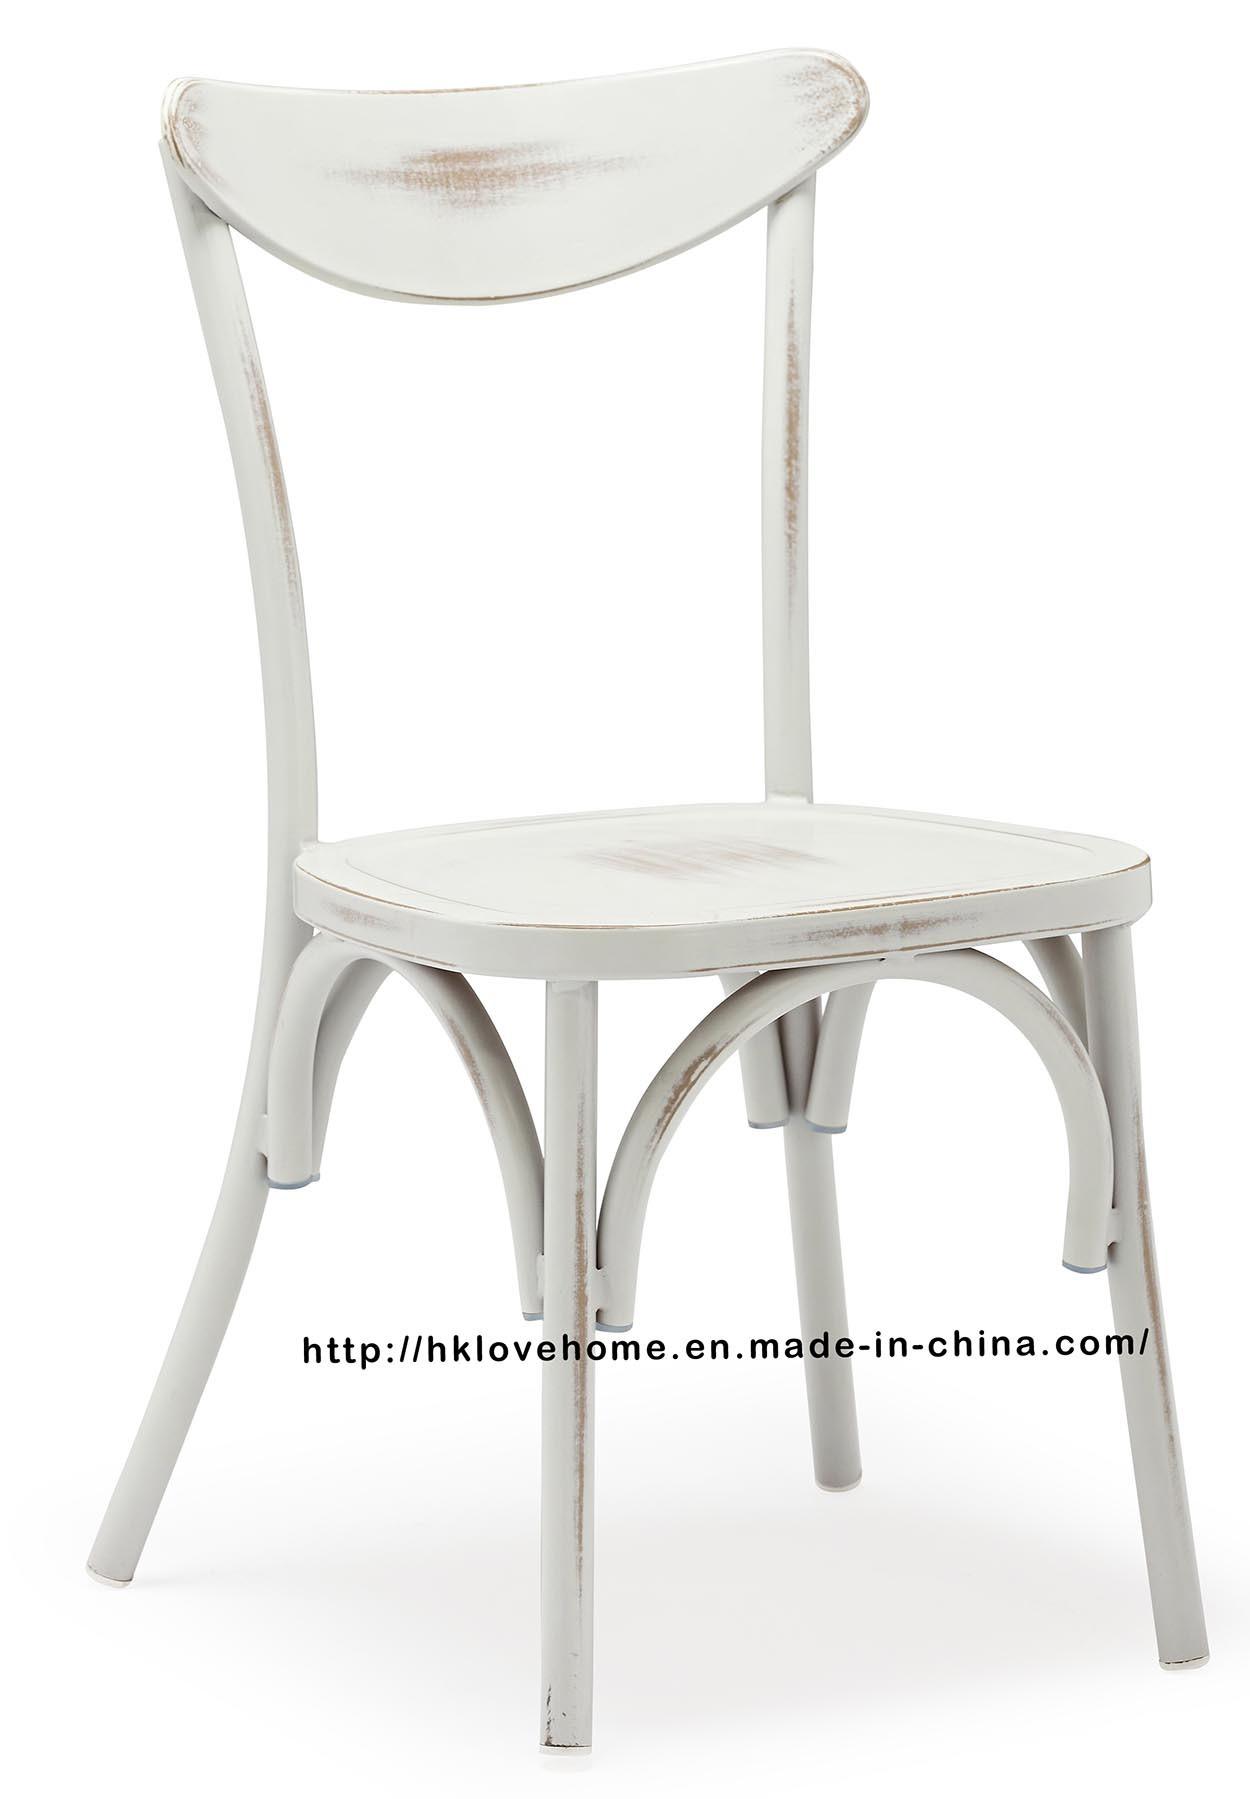 Hot Item Restaurant Coffee Garden Outdoor Stackable Antique Metal Dining Chairs